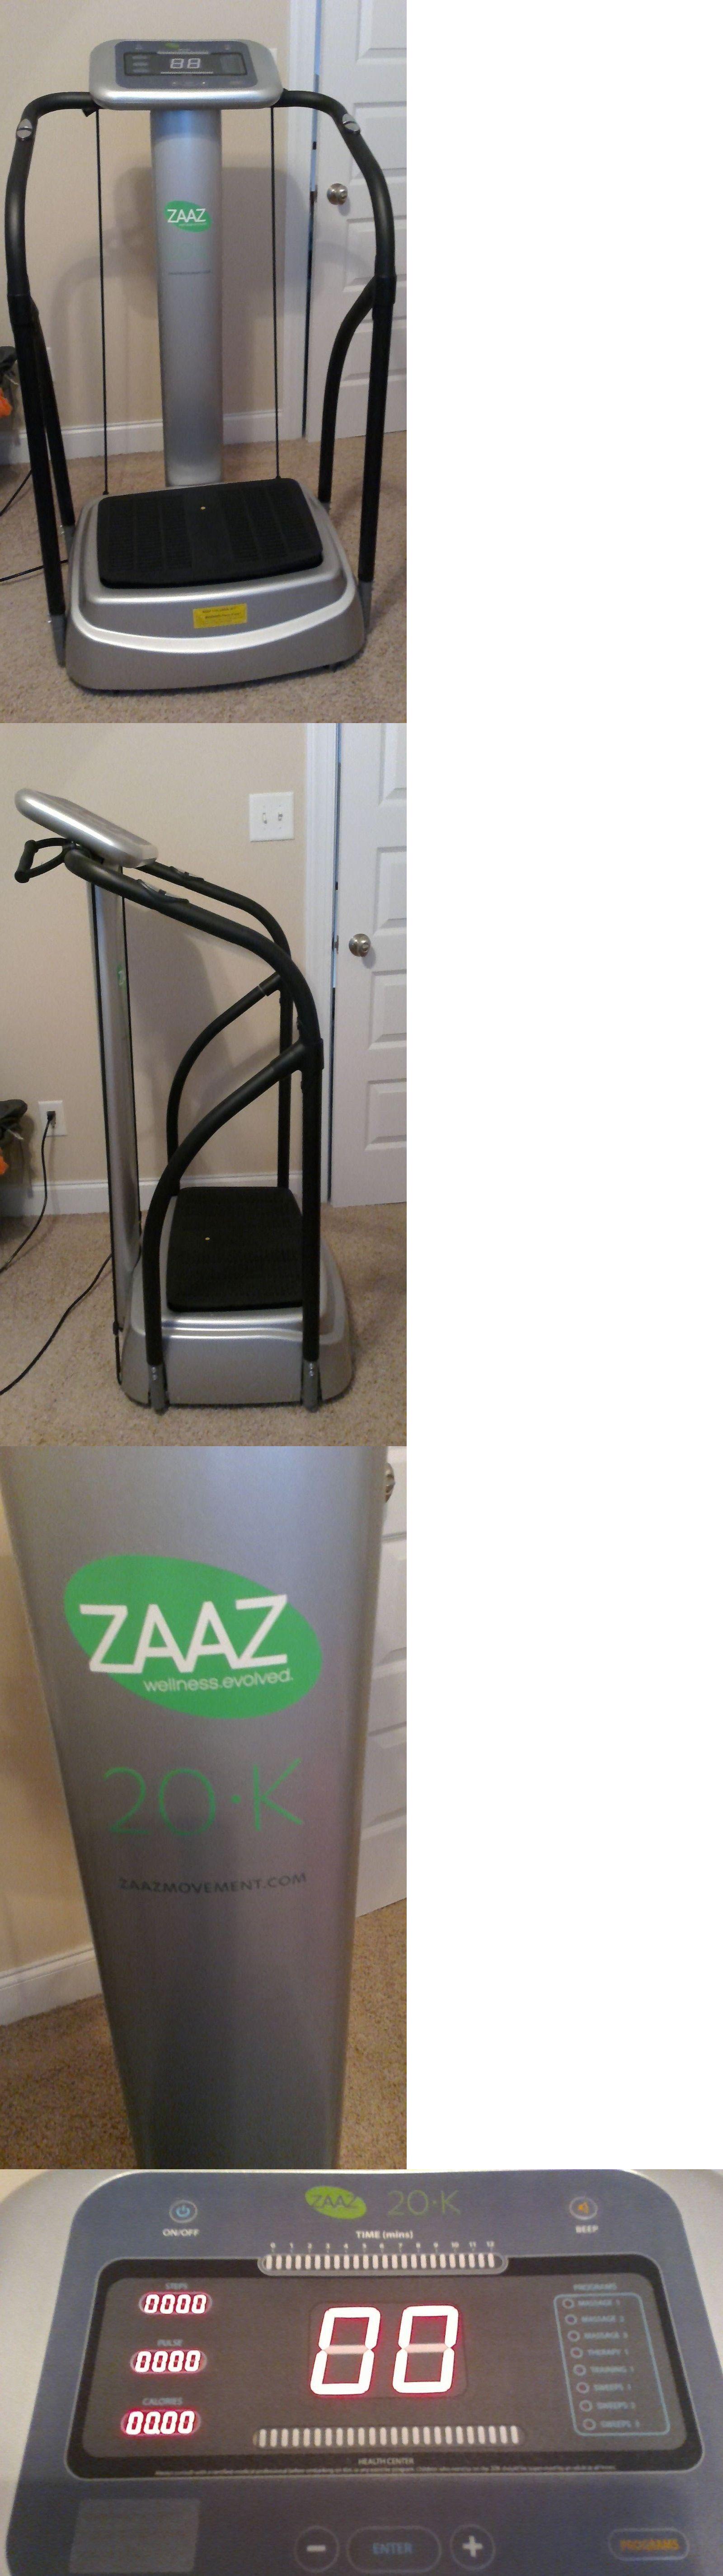 Vibration Platform Machines 171593 Zaaz 20k Whole Body Vibration